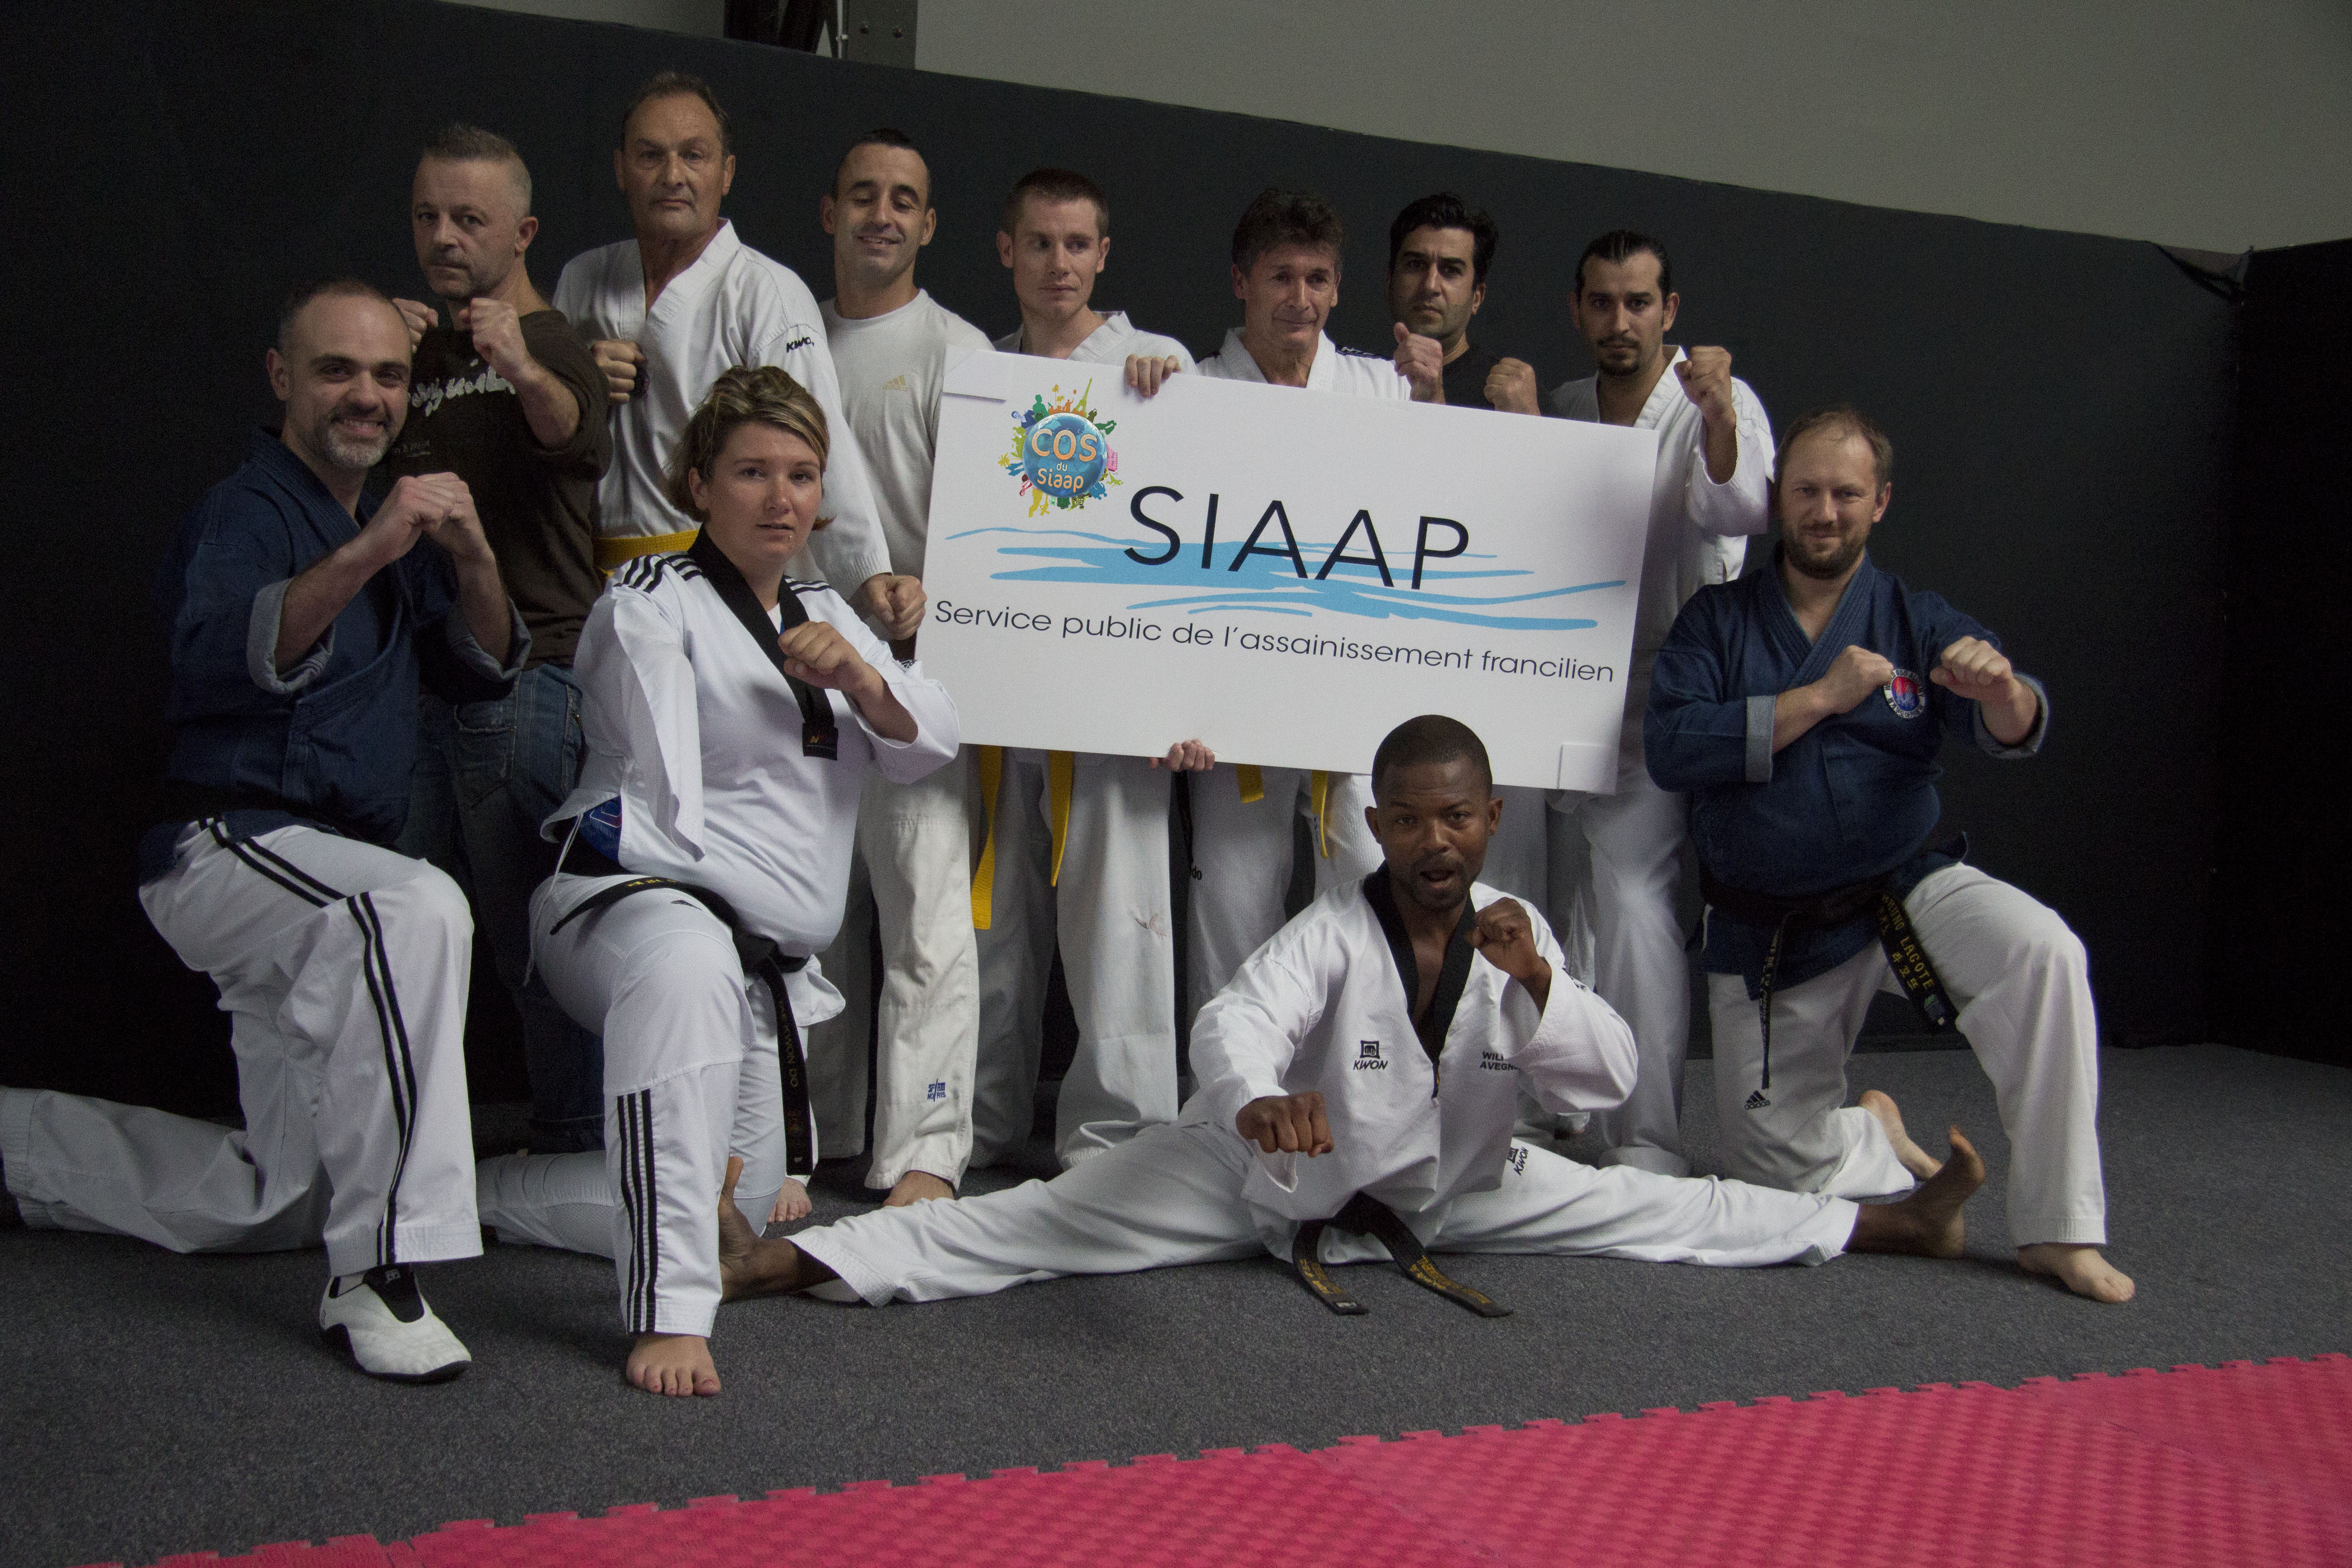 COS du SIAAP 06